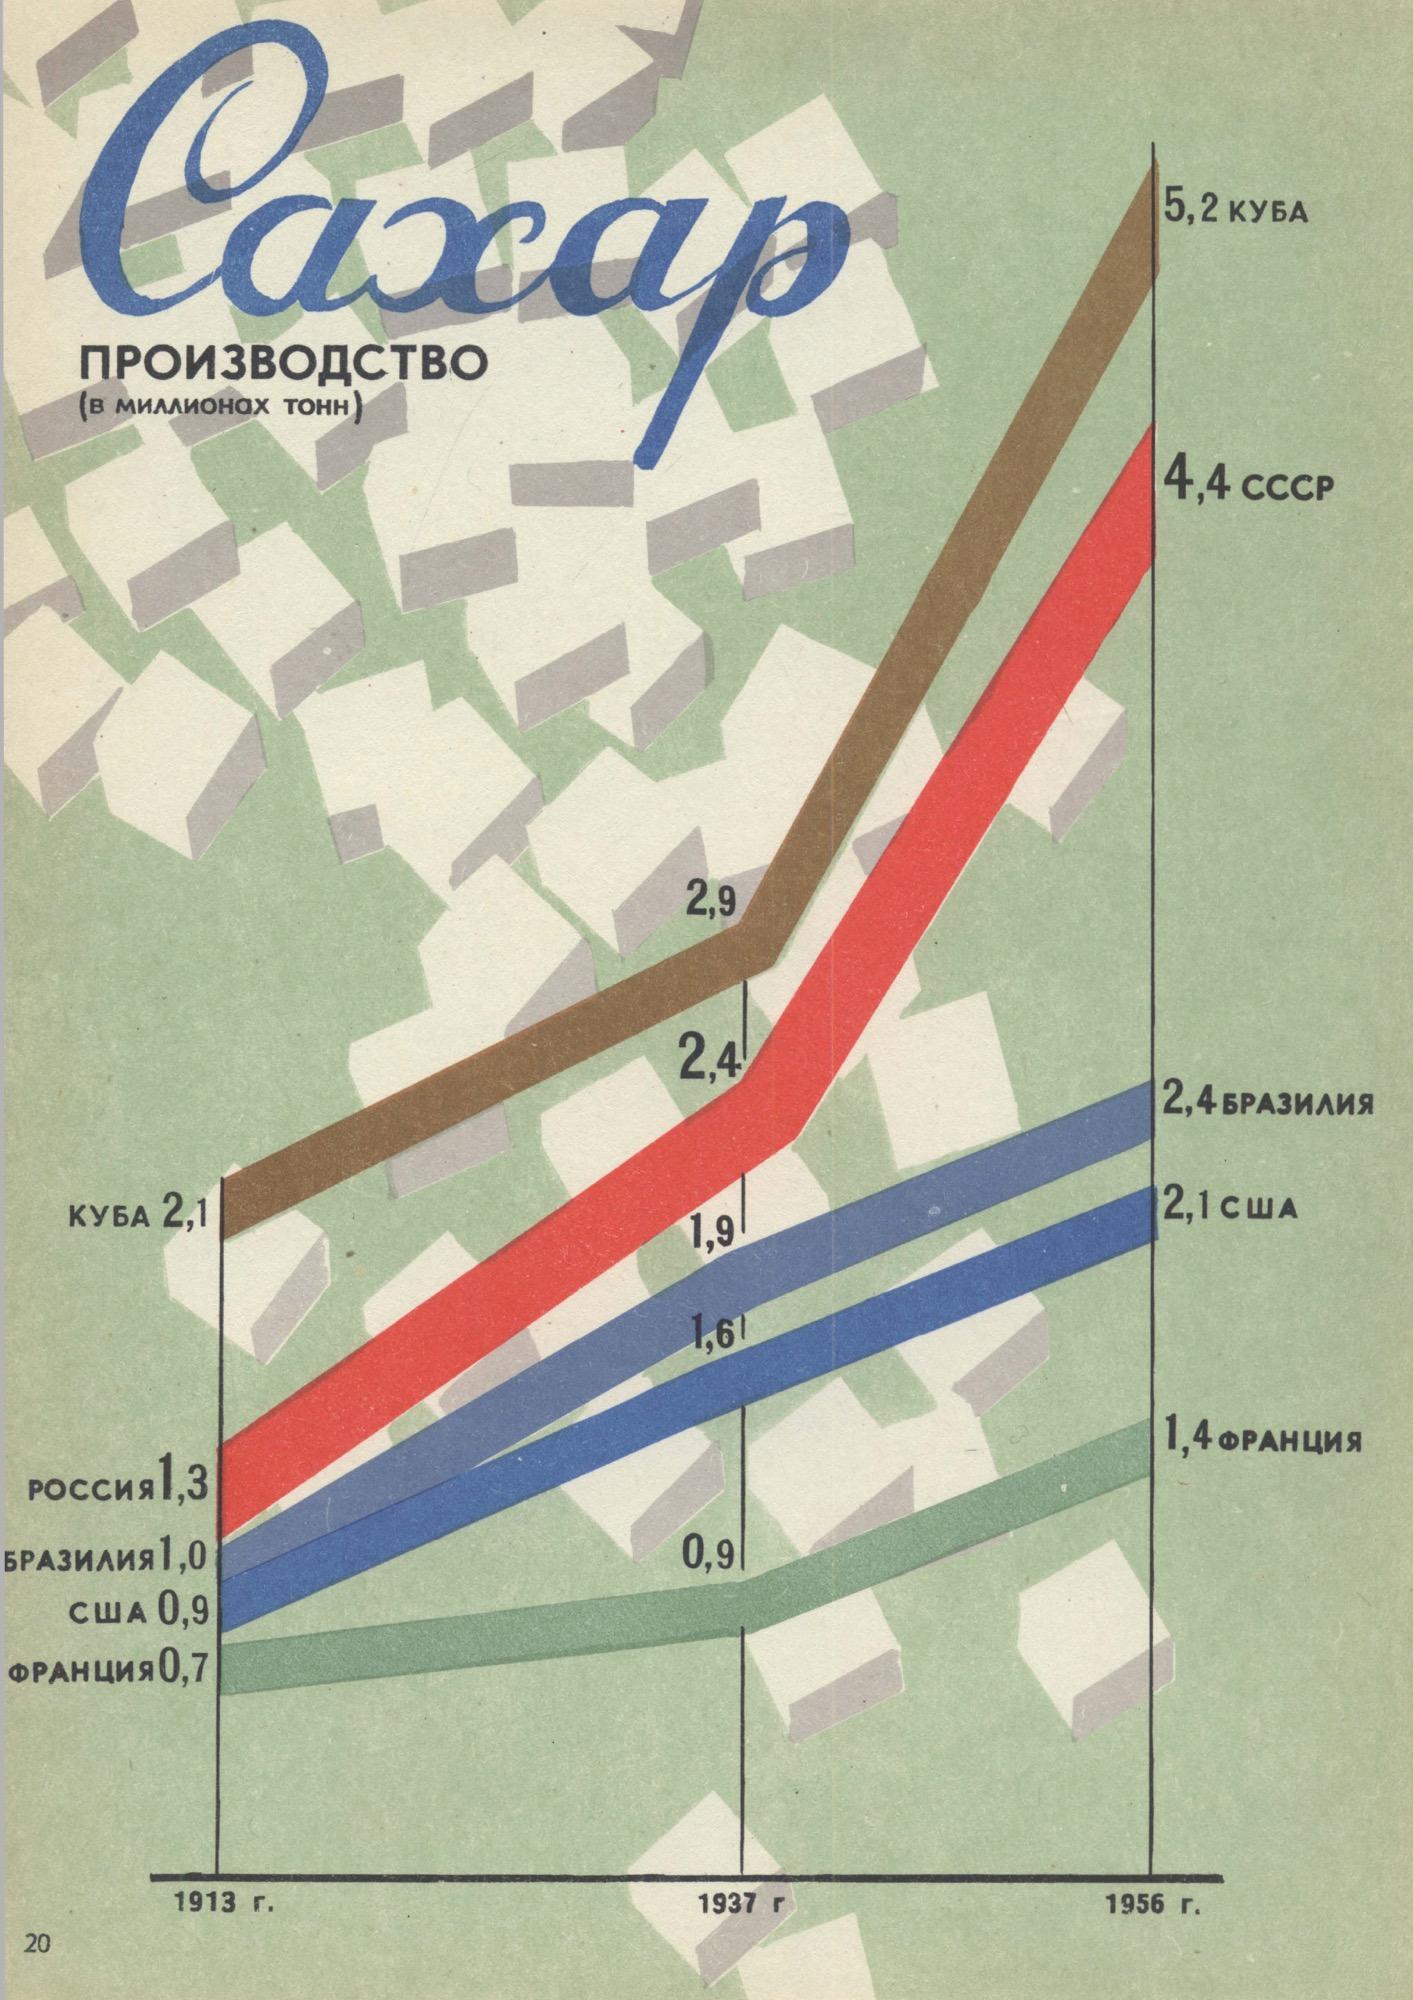 cccp infographics 20 copy